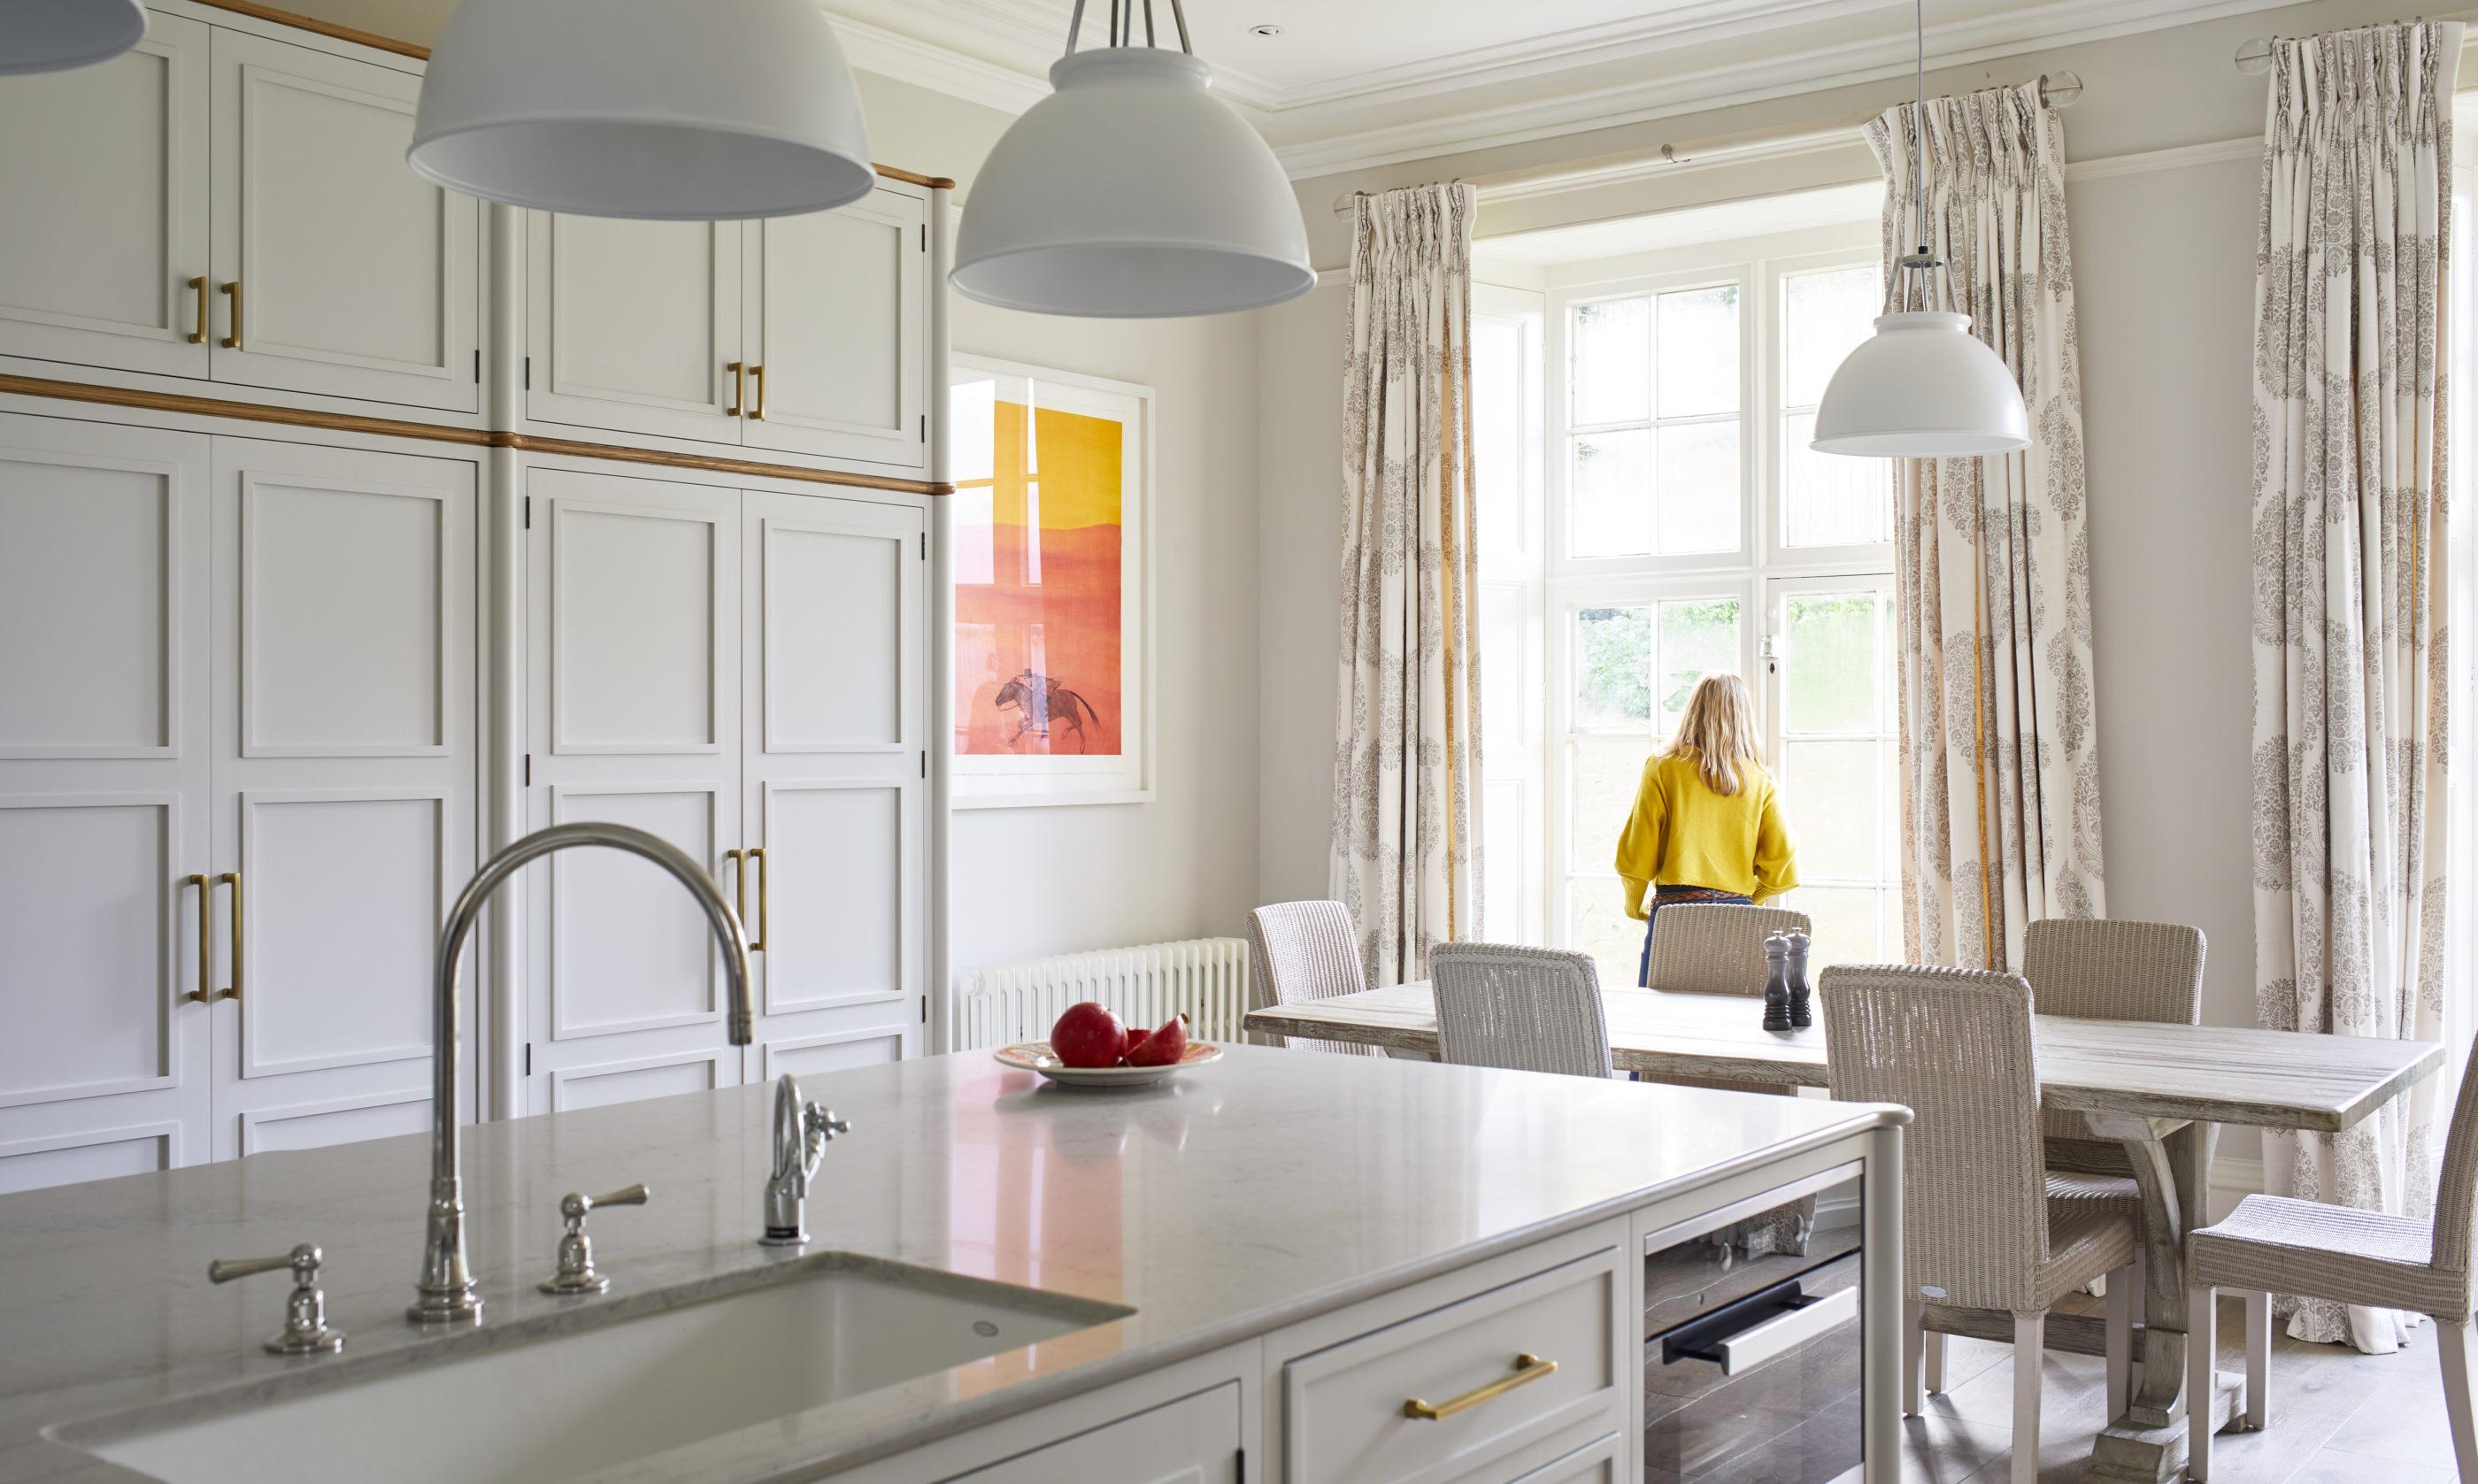 Bespoke Kitchen Design Wiltshire & Dorset | Guild Anderson